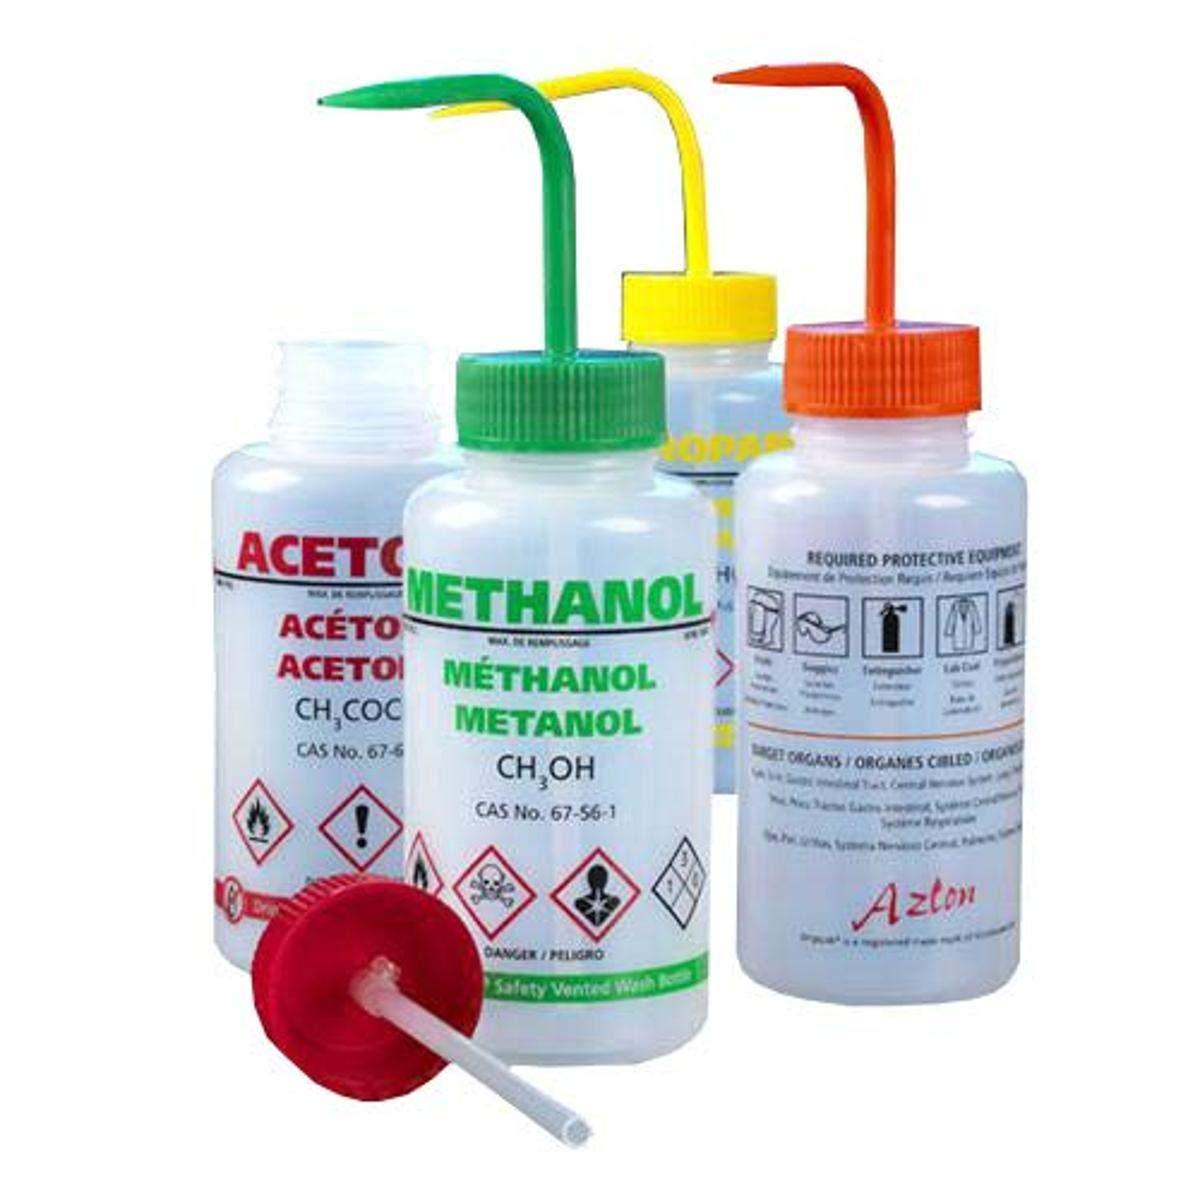 Safety Vented Orange Screwcap Ethanol GHS Compliant Globe Scientific WGW541VTML-GHS1 Low-Density Polyethylene Multi-Lingual Wash Bottle 500 mL